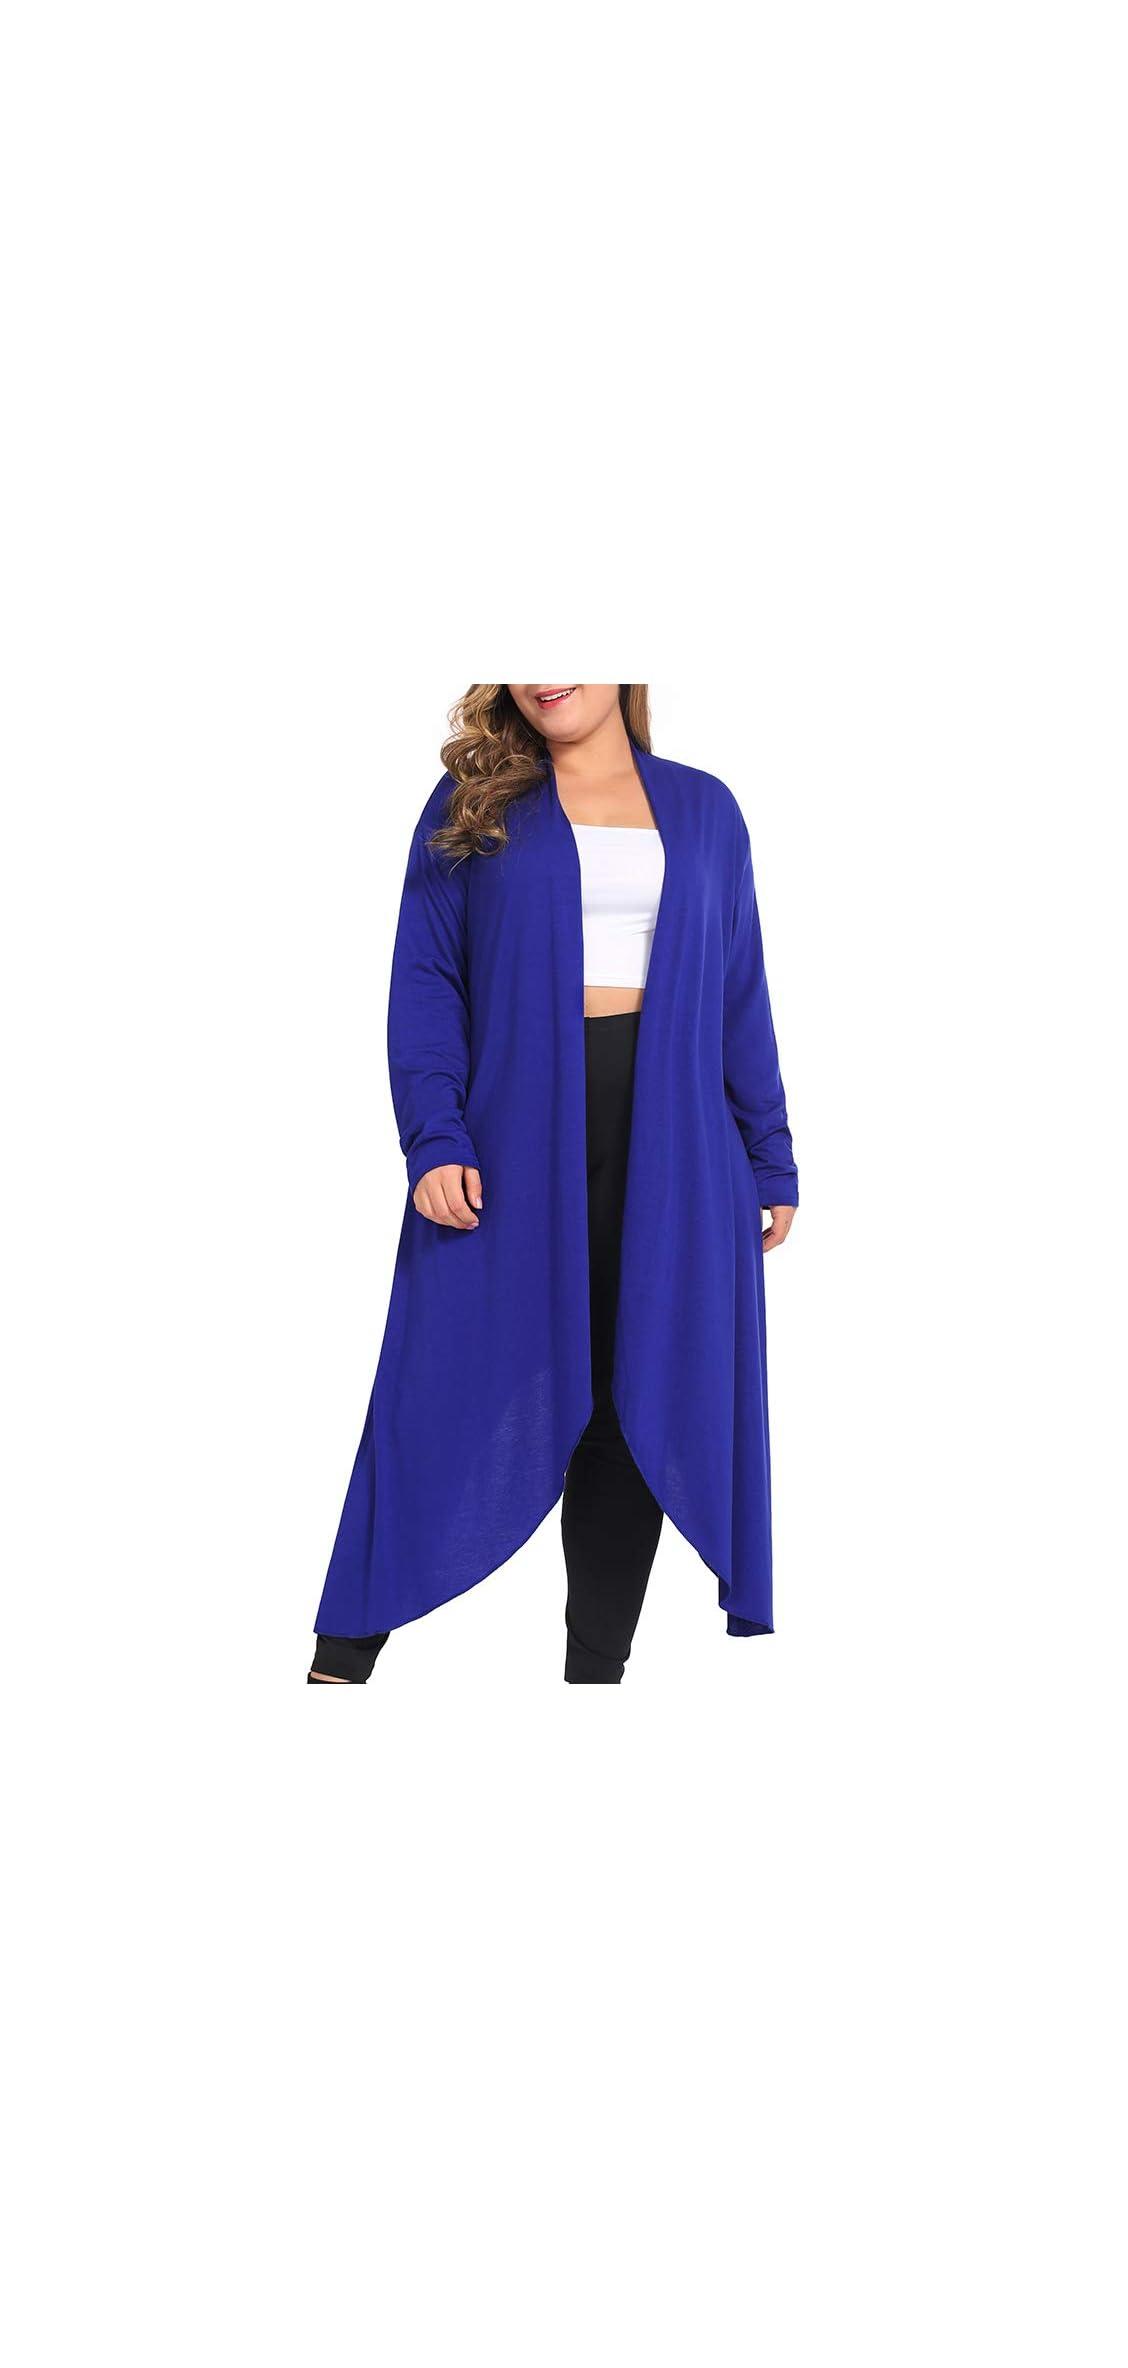 Women's Plus Size Cardigans Long Sleeve Casual Open